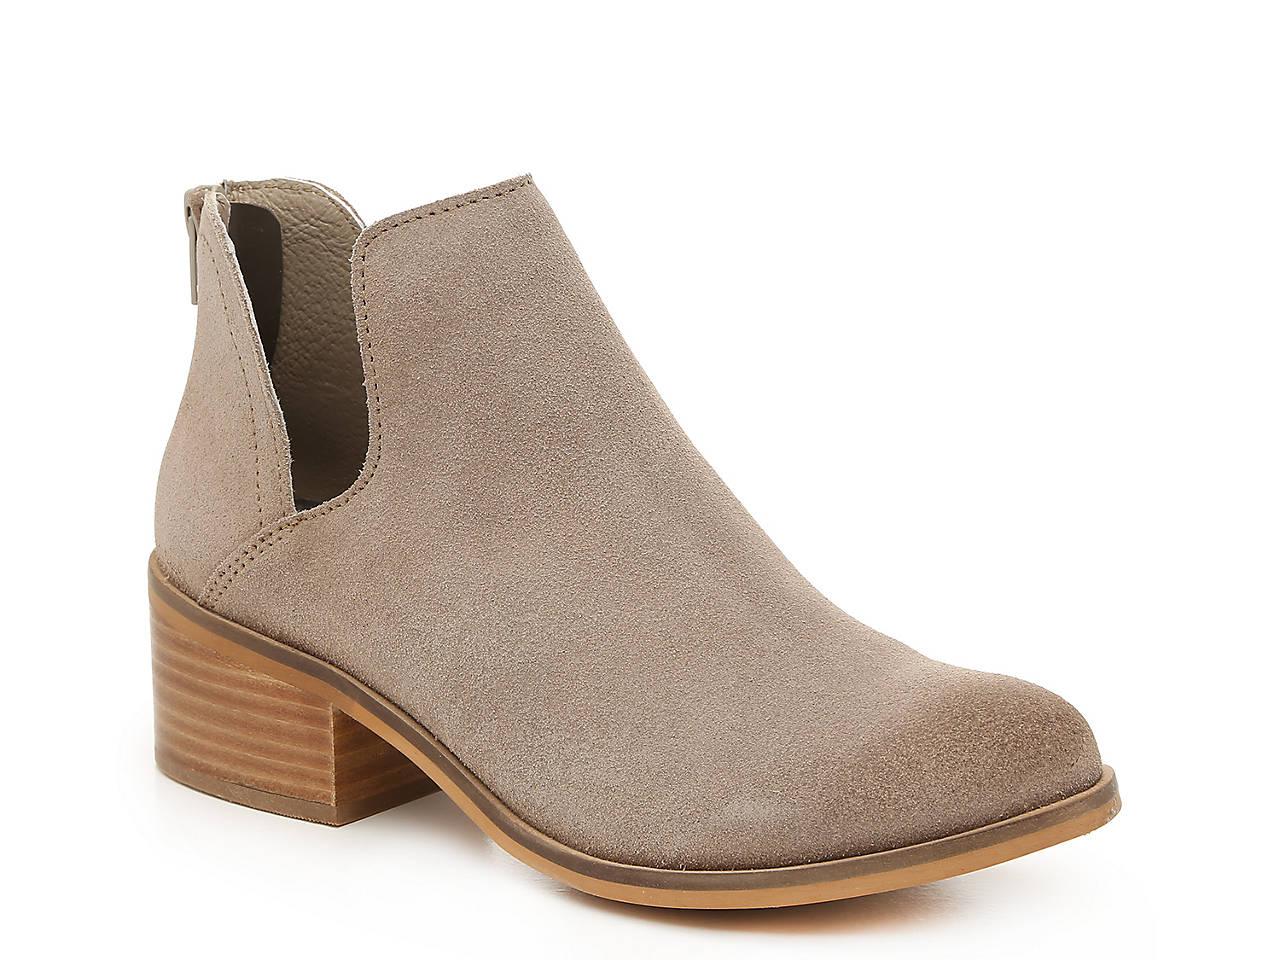 c34aca556f8 Steve Madden Lancaster Bootie Women s Shoes